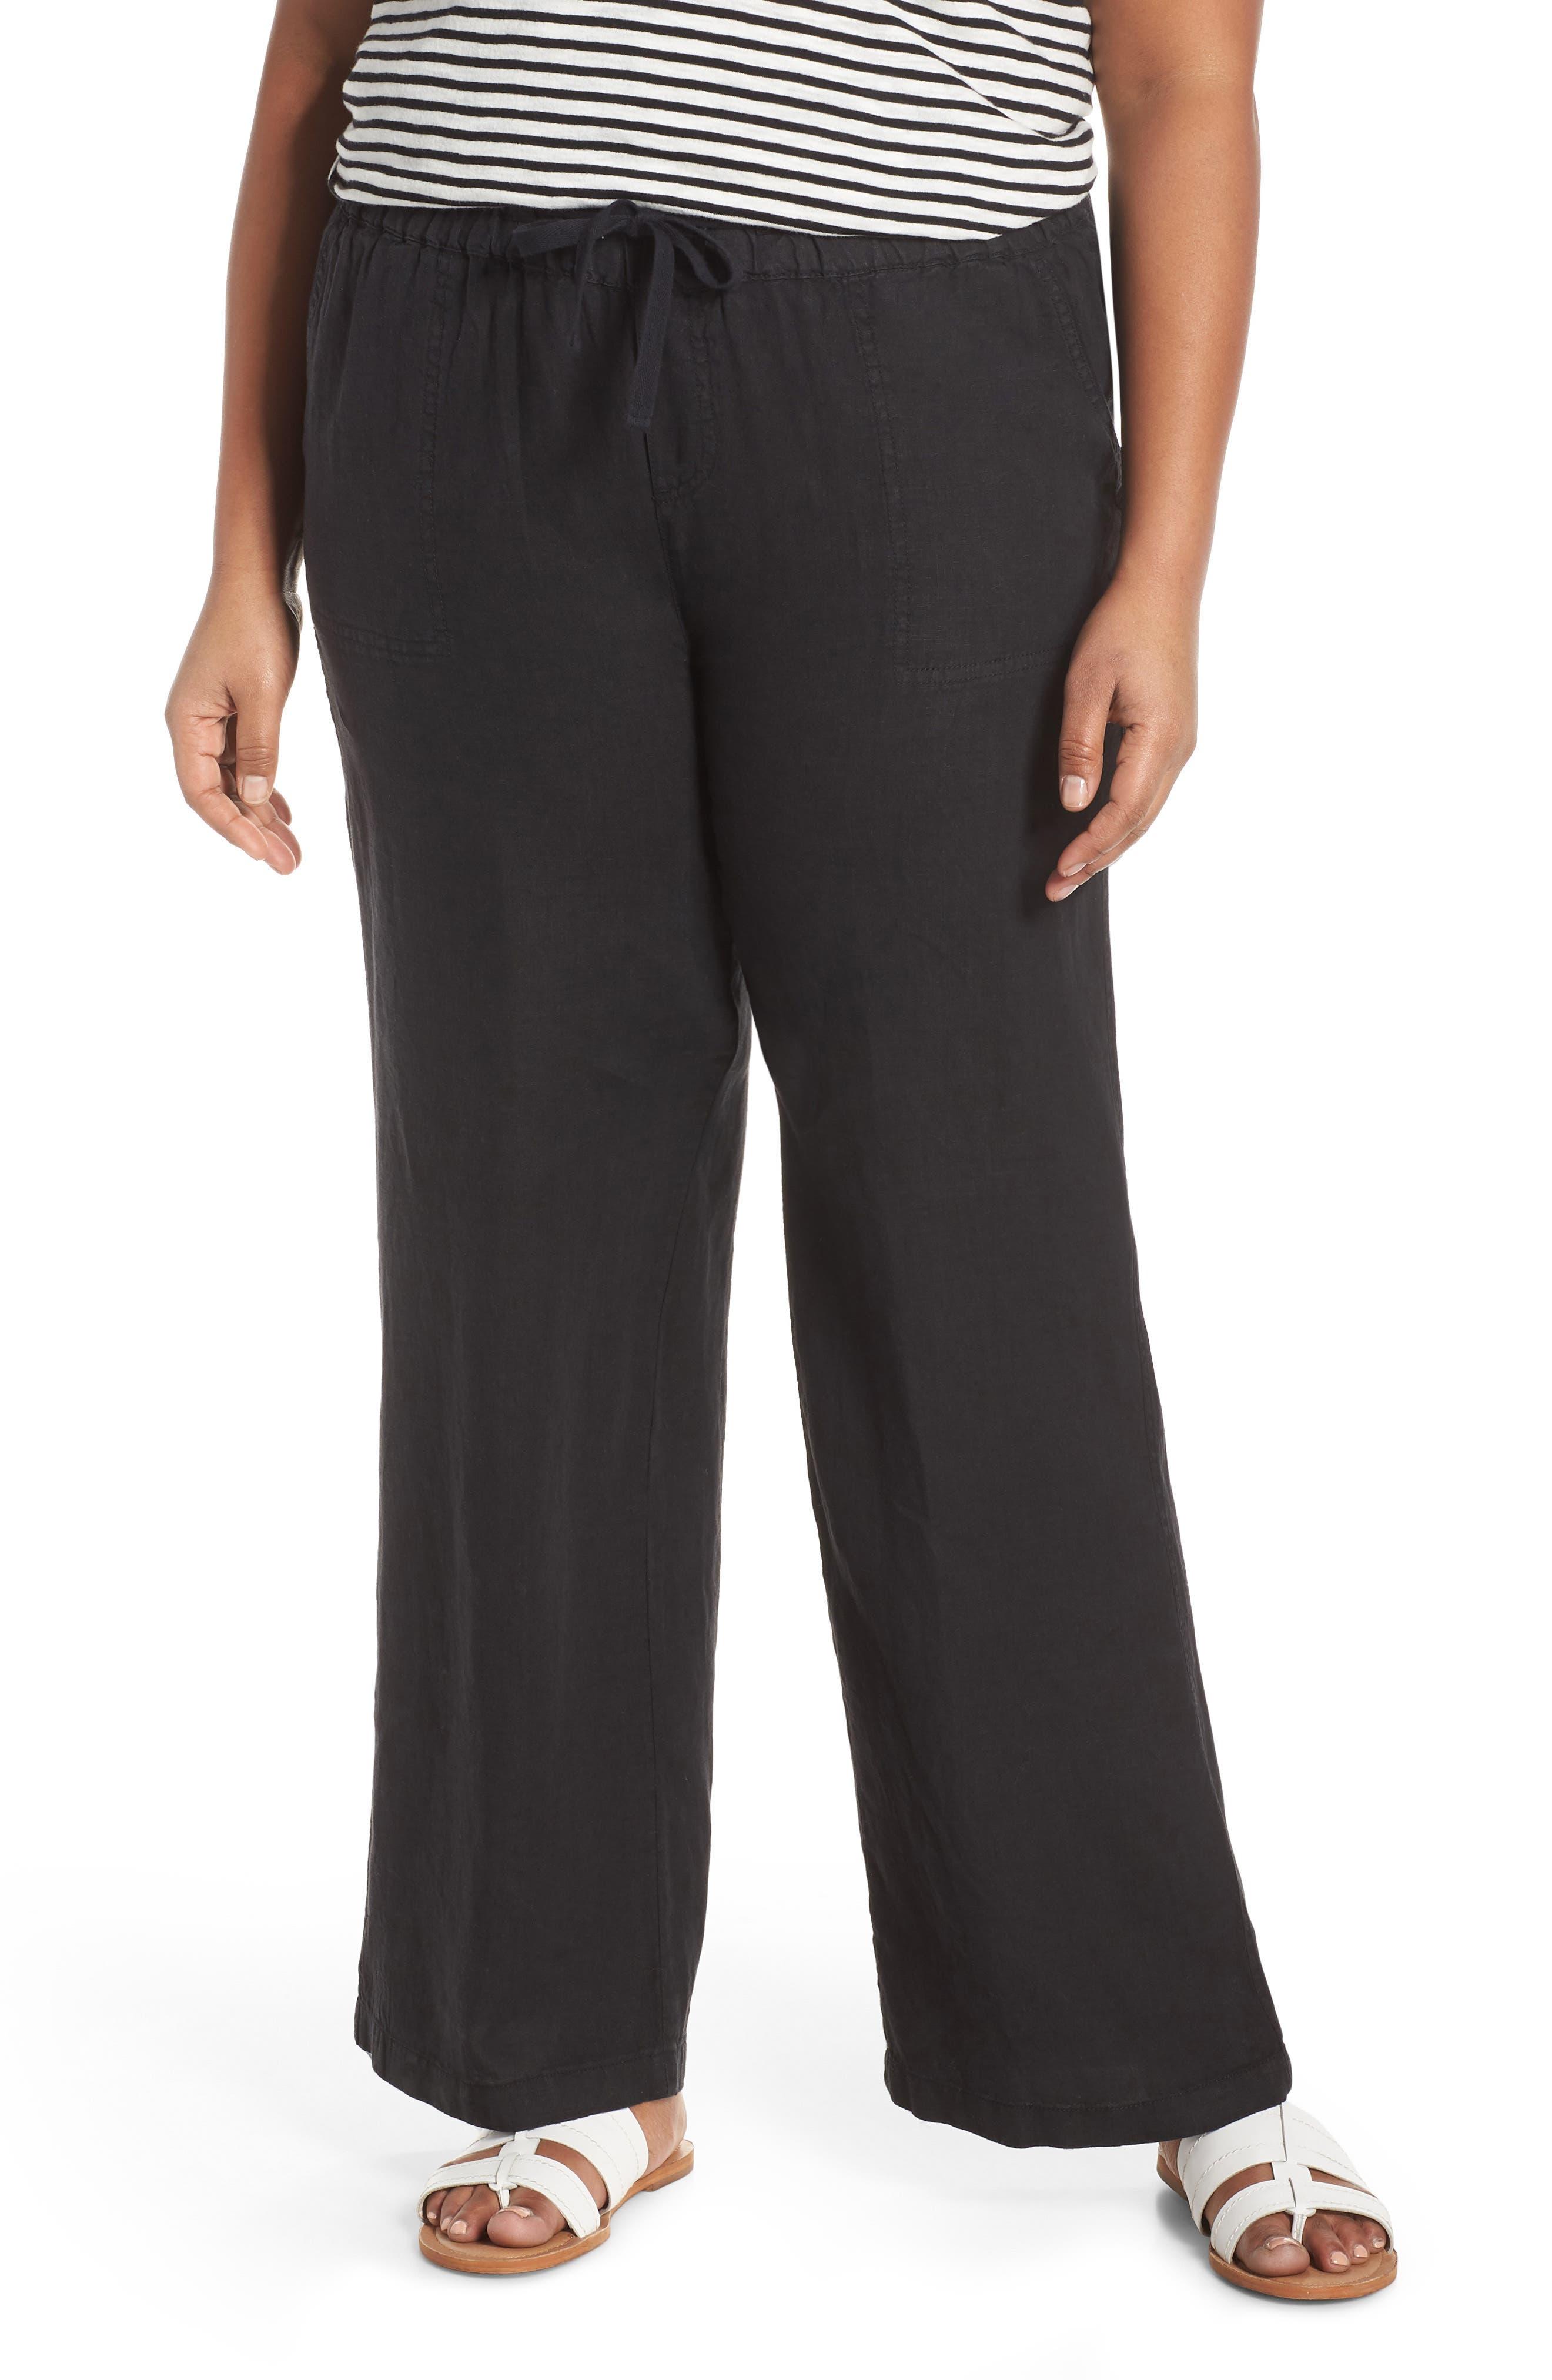 Plus Size Women's Caslon Linen Blend Drawstring Pants